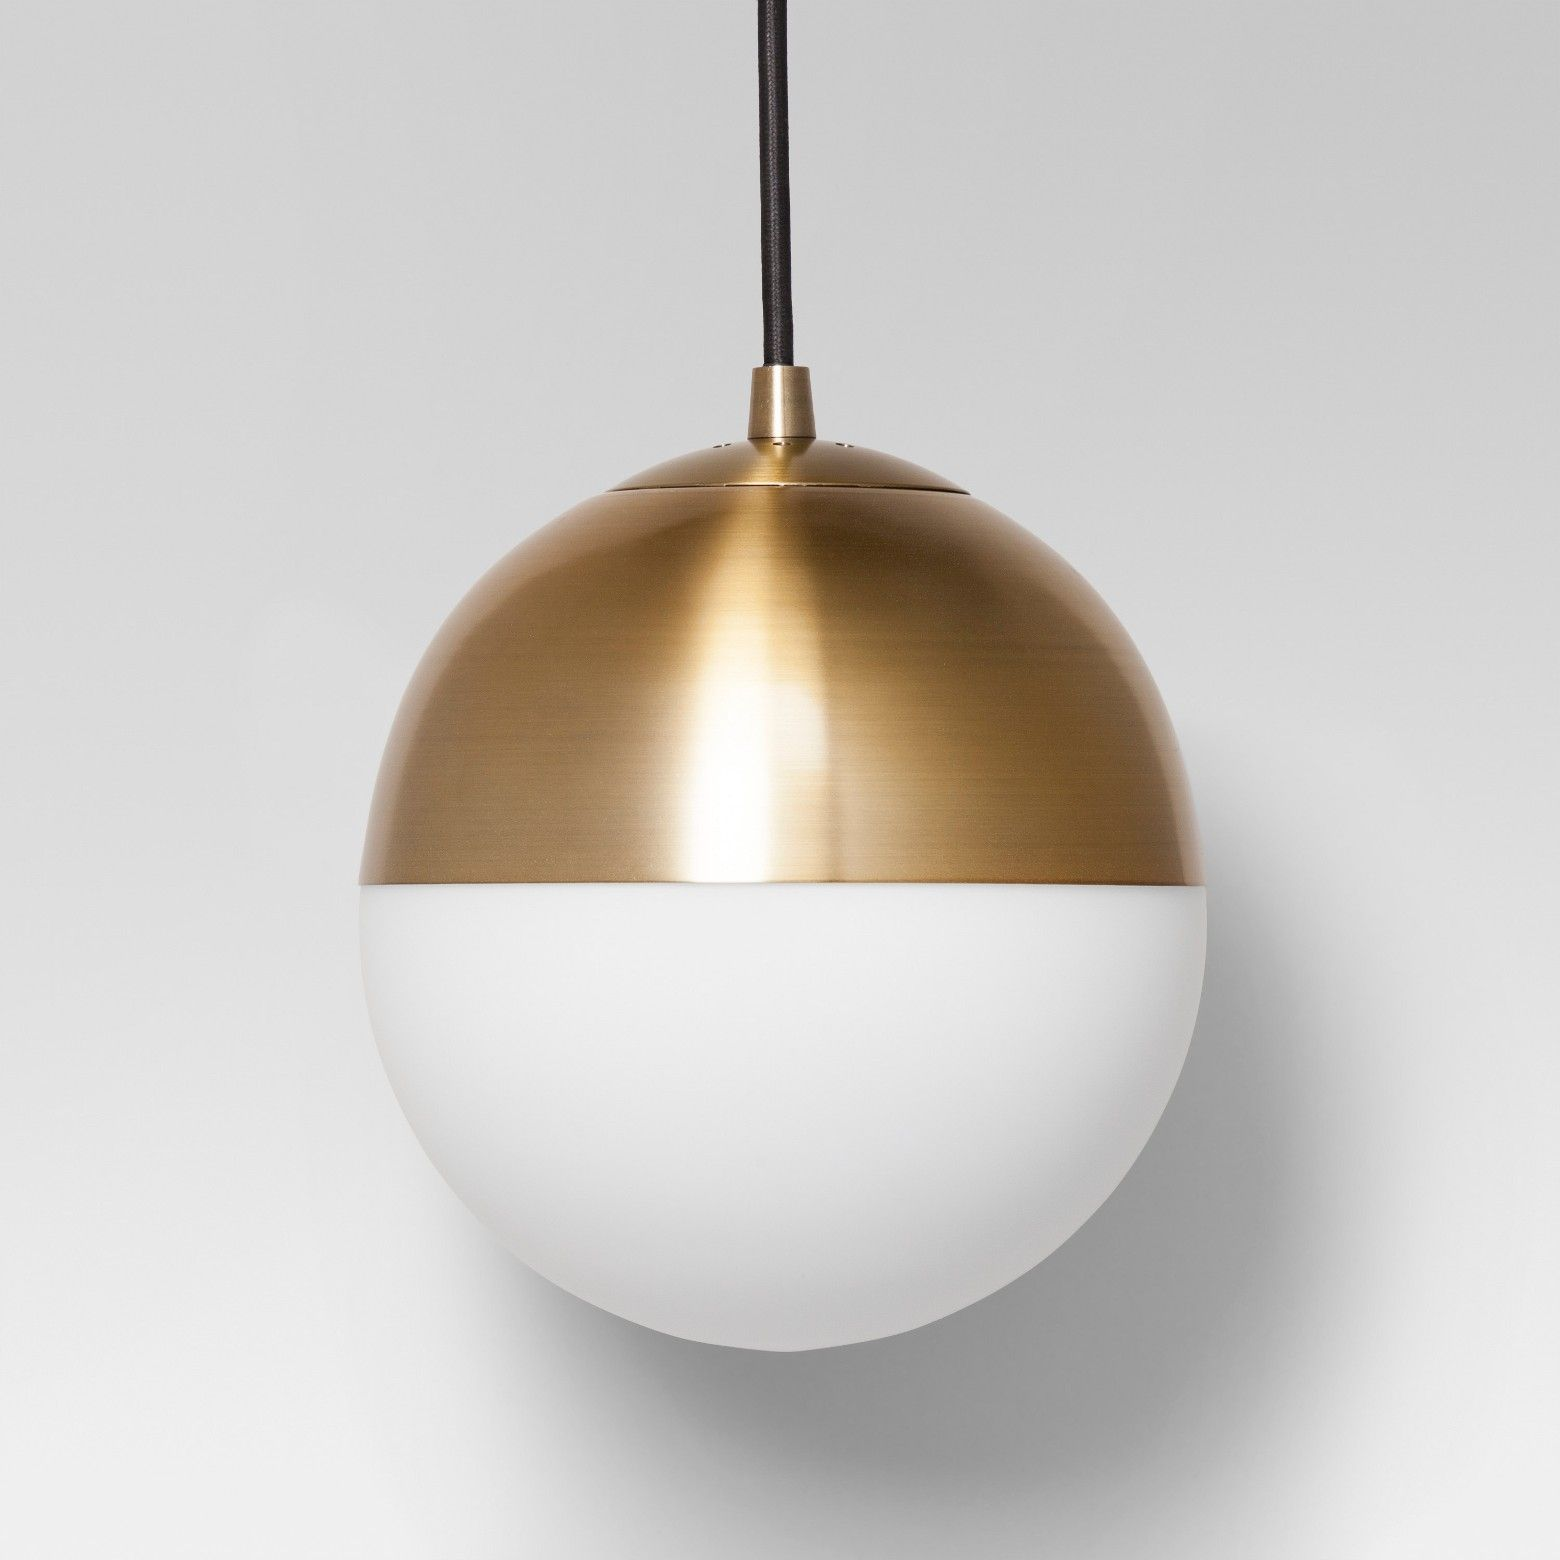 Geneva glass globe pendant includes cfl bulb brass project 62 geneva glass globe pendant includes cfl bulb brass project 62 target for the kitchen aloadofball Image collections